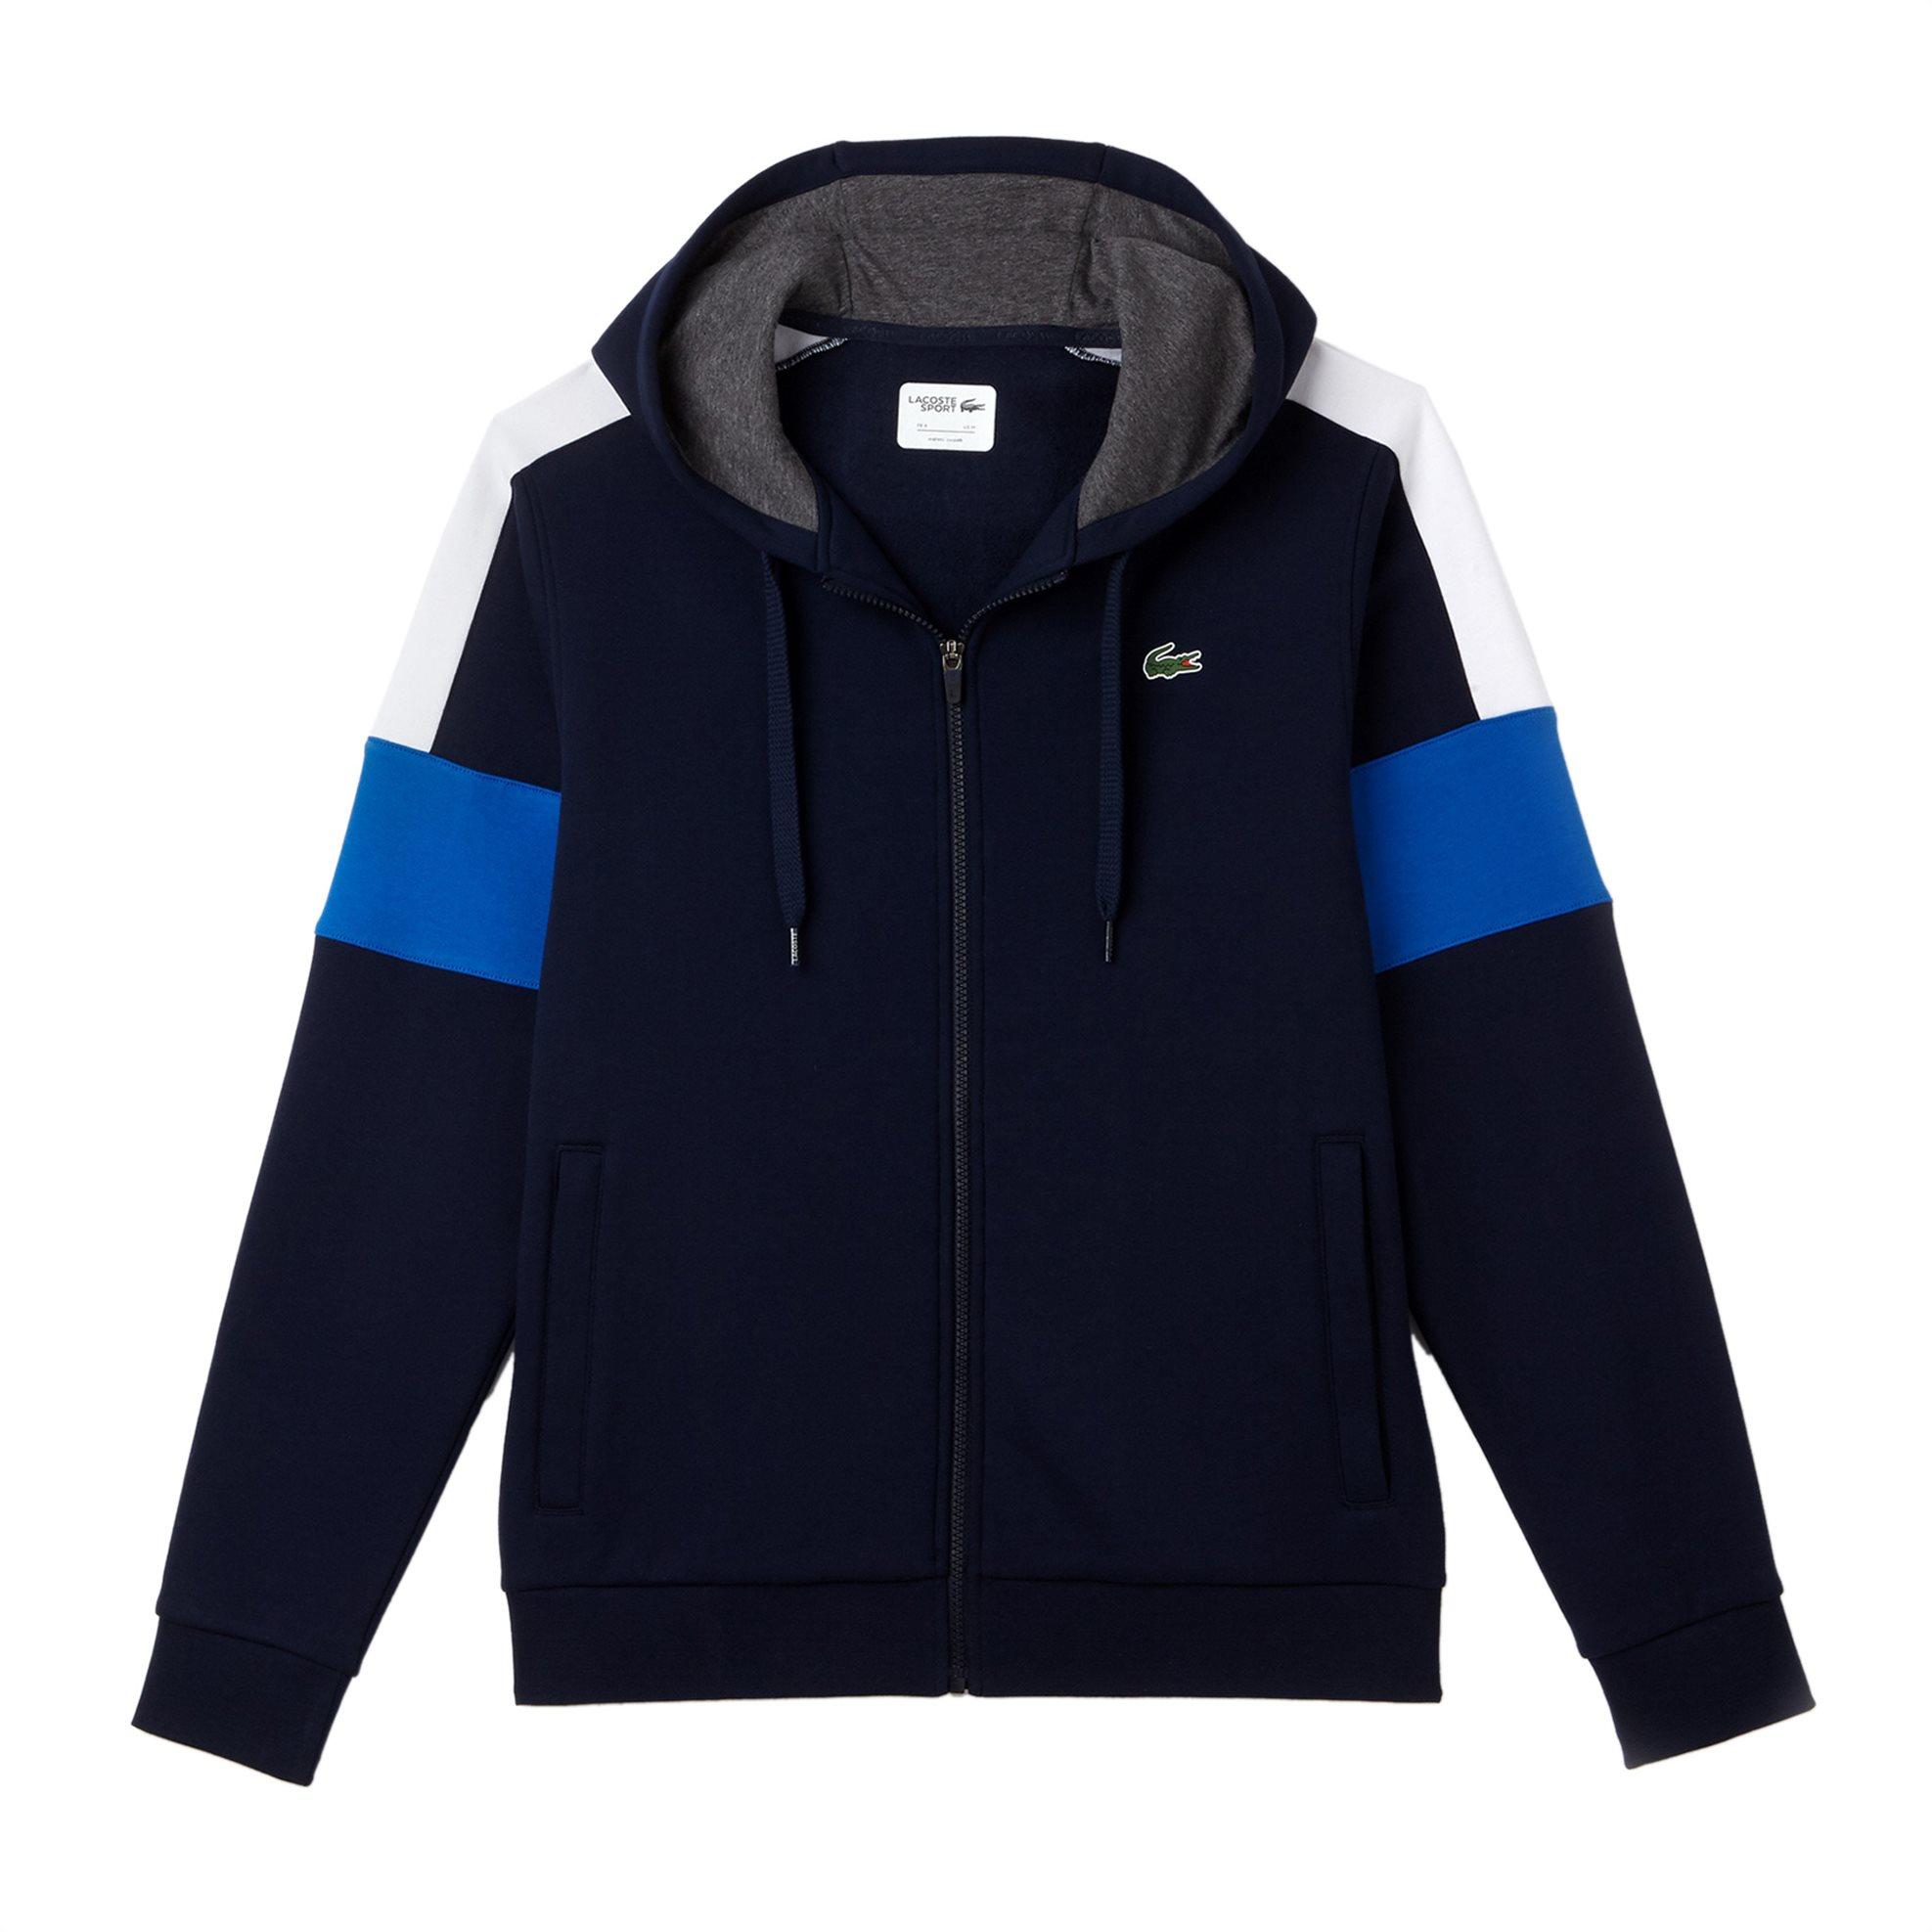 Lacoste ανδρική ζακέτα φούτερ με colorblocks Lacoste's Tennis Collection - SH949 ανδρασ   ρουχα   μπλούζες   φούτερ   ζακέτες